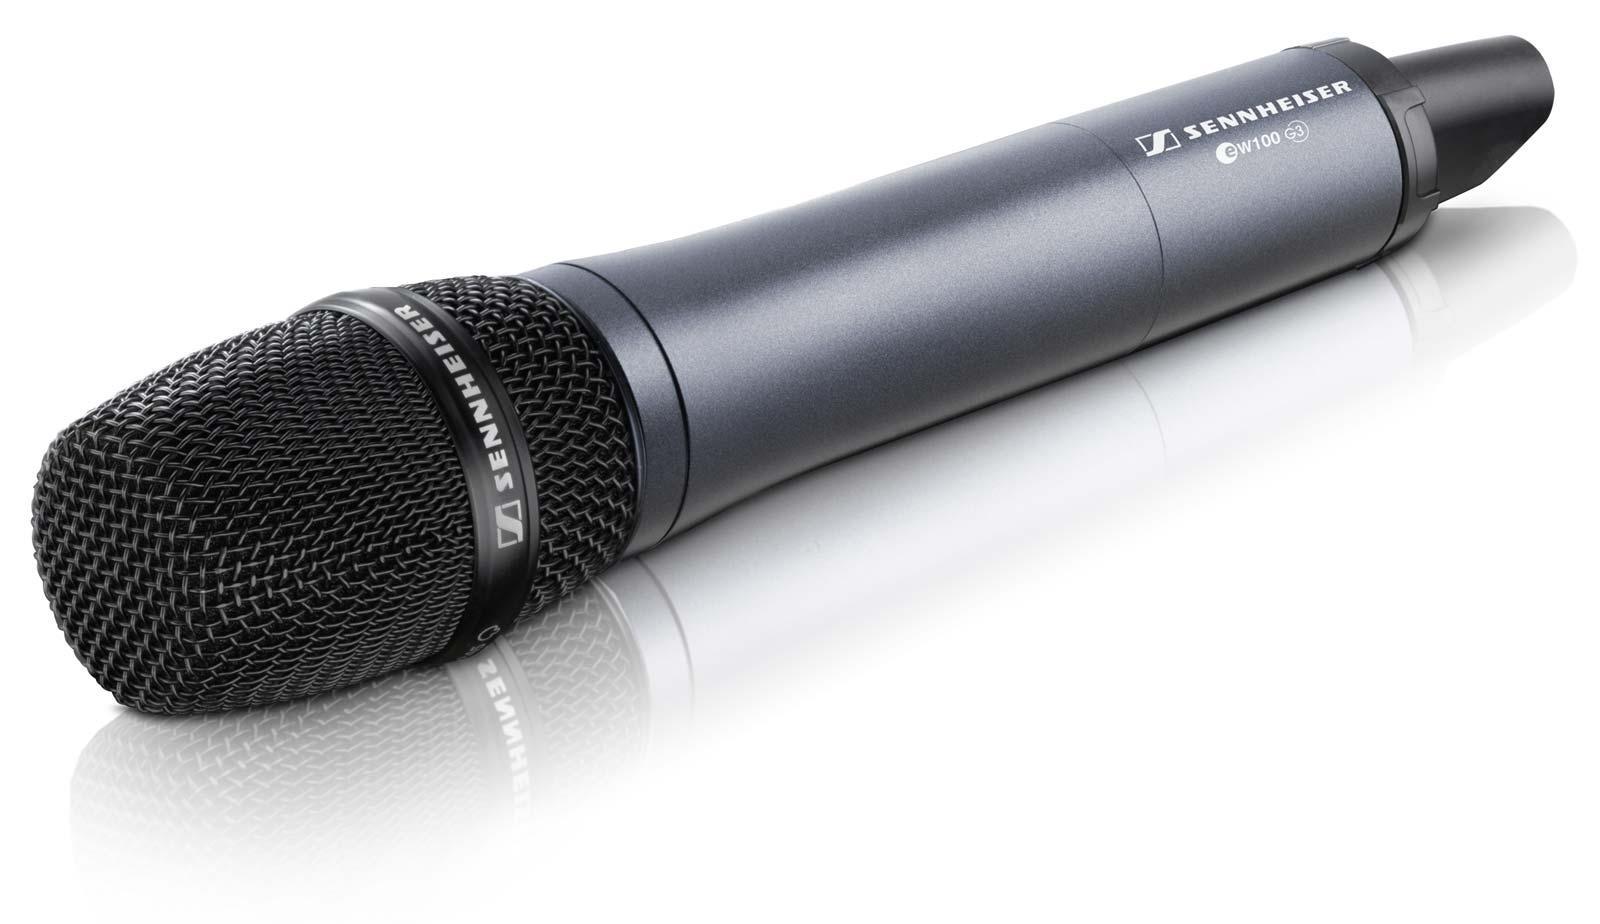 sennheiser ew 100 935 g3 b handheld wireless microphone system agiprodj. Black Bedroom Furniture Sets. Home Design Ideas